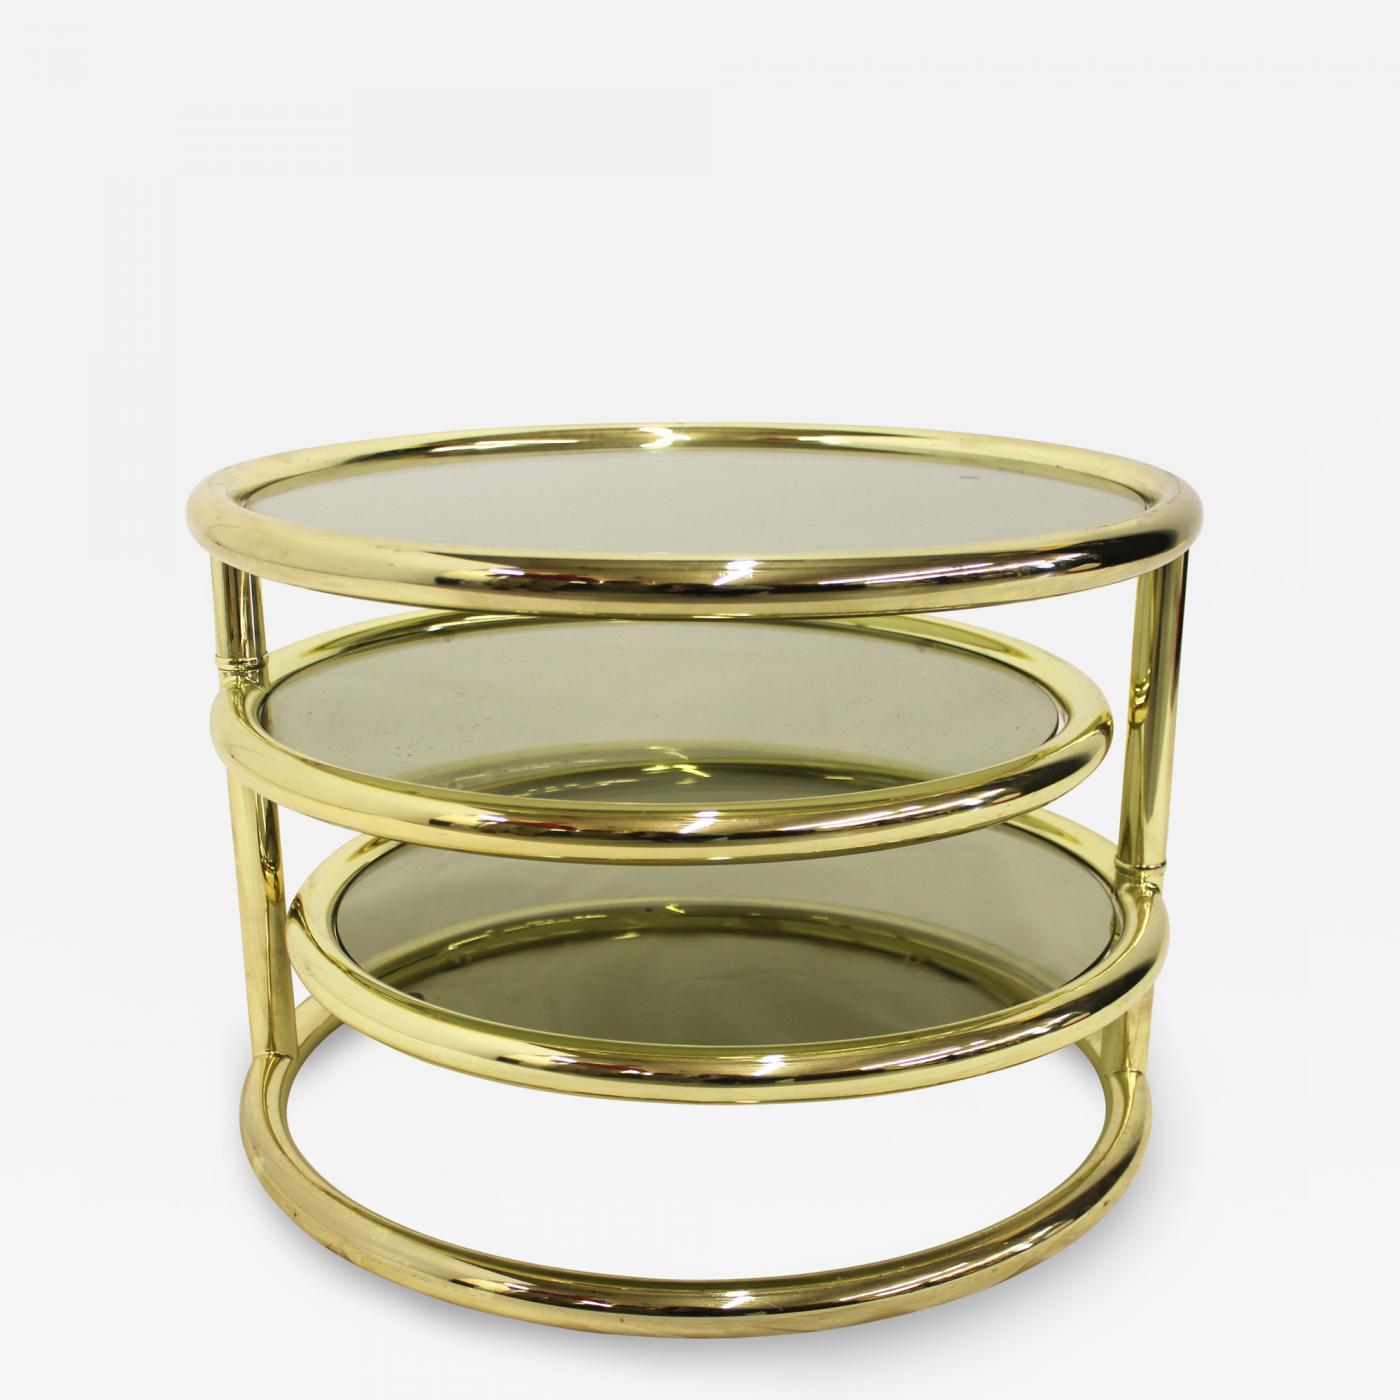 Milo Baughman Circular Three Tier Swivel Coffee Table